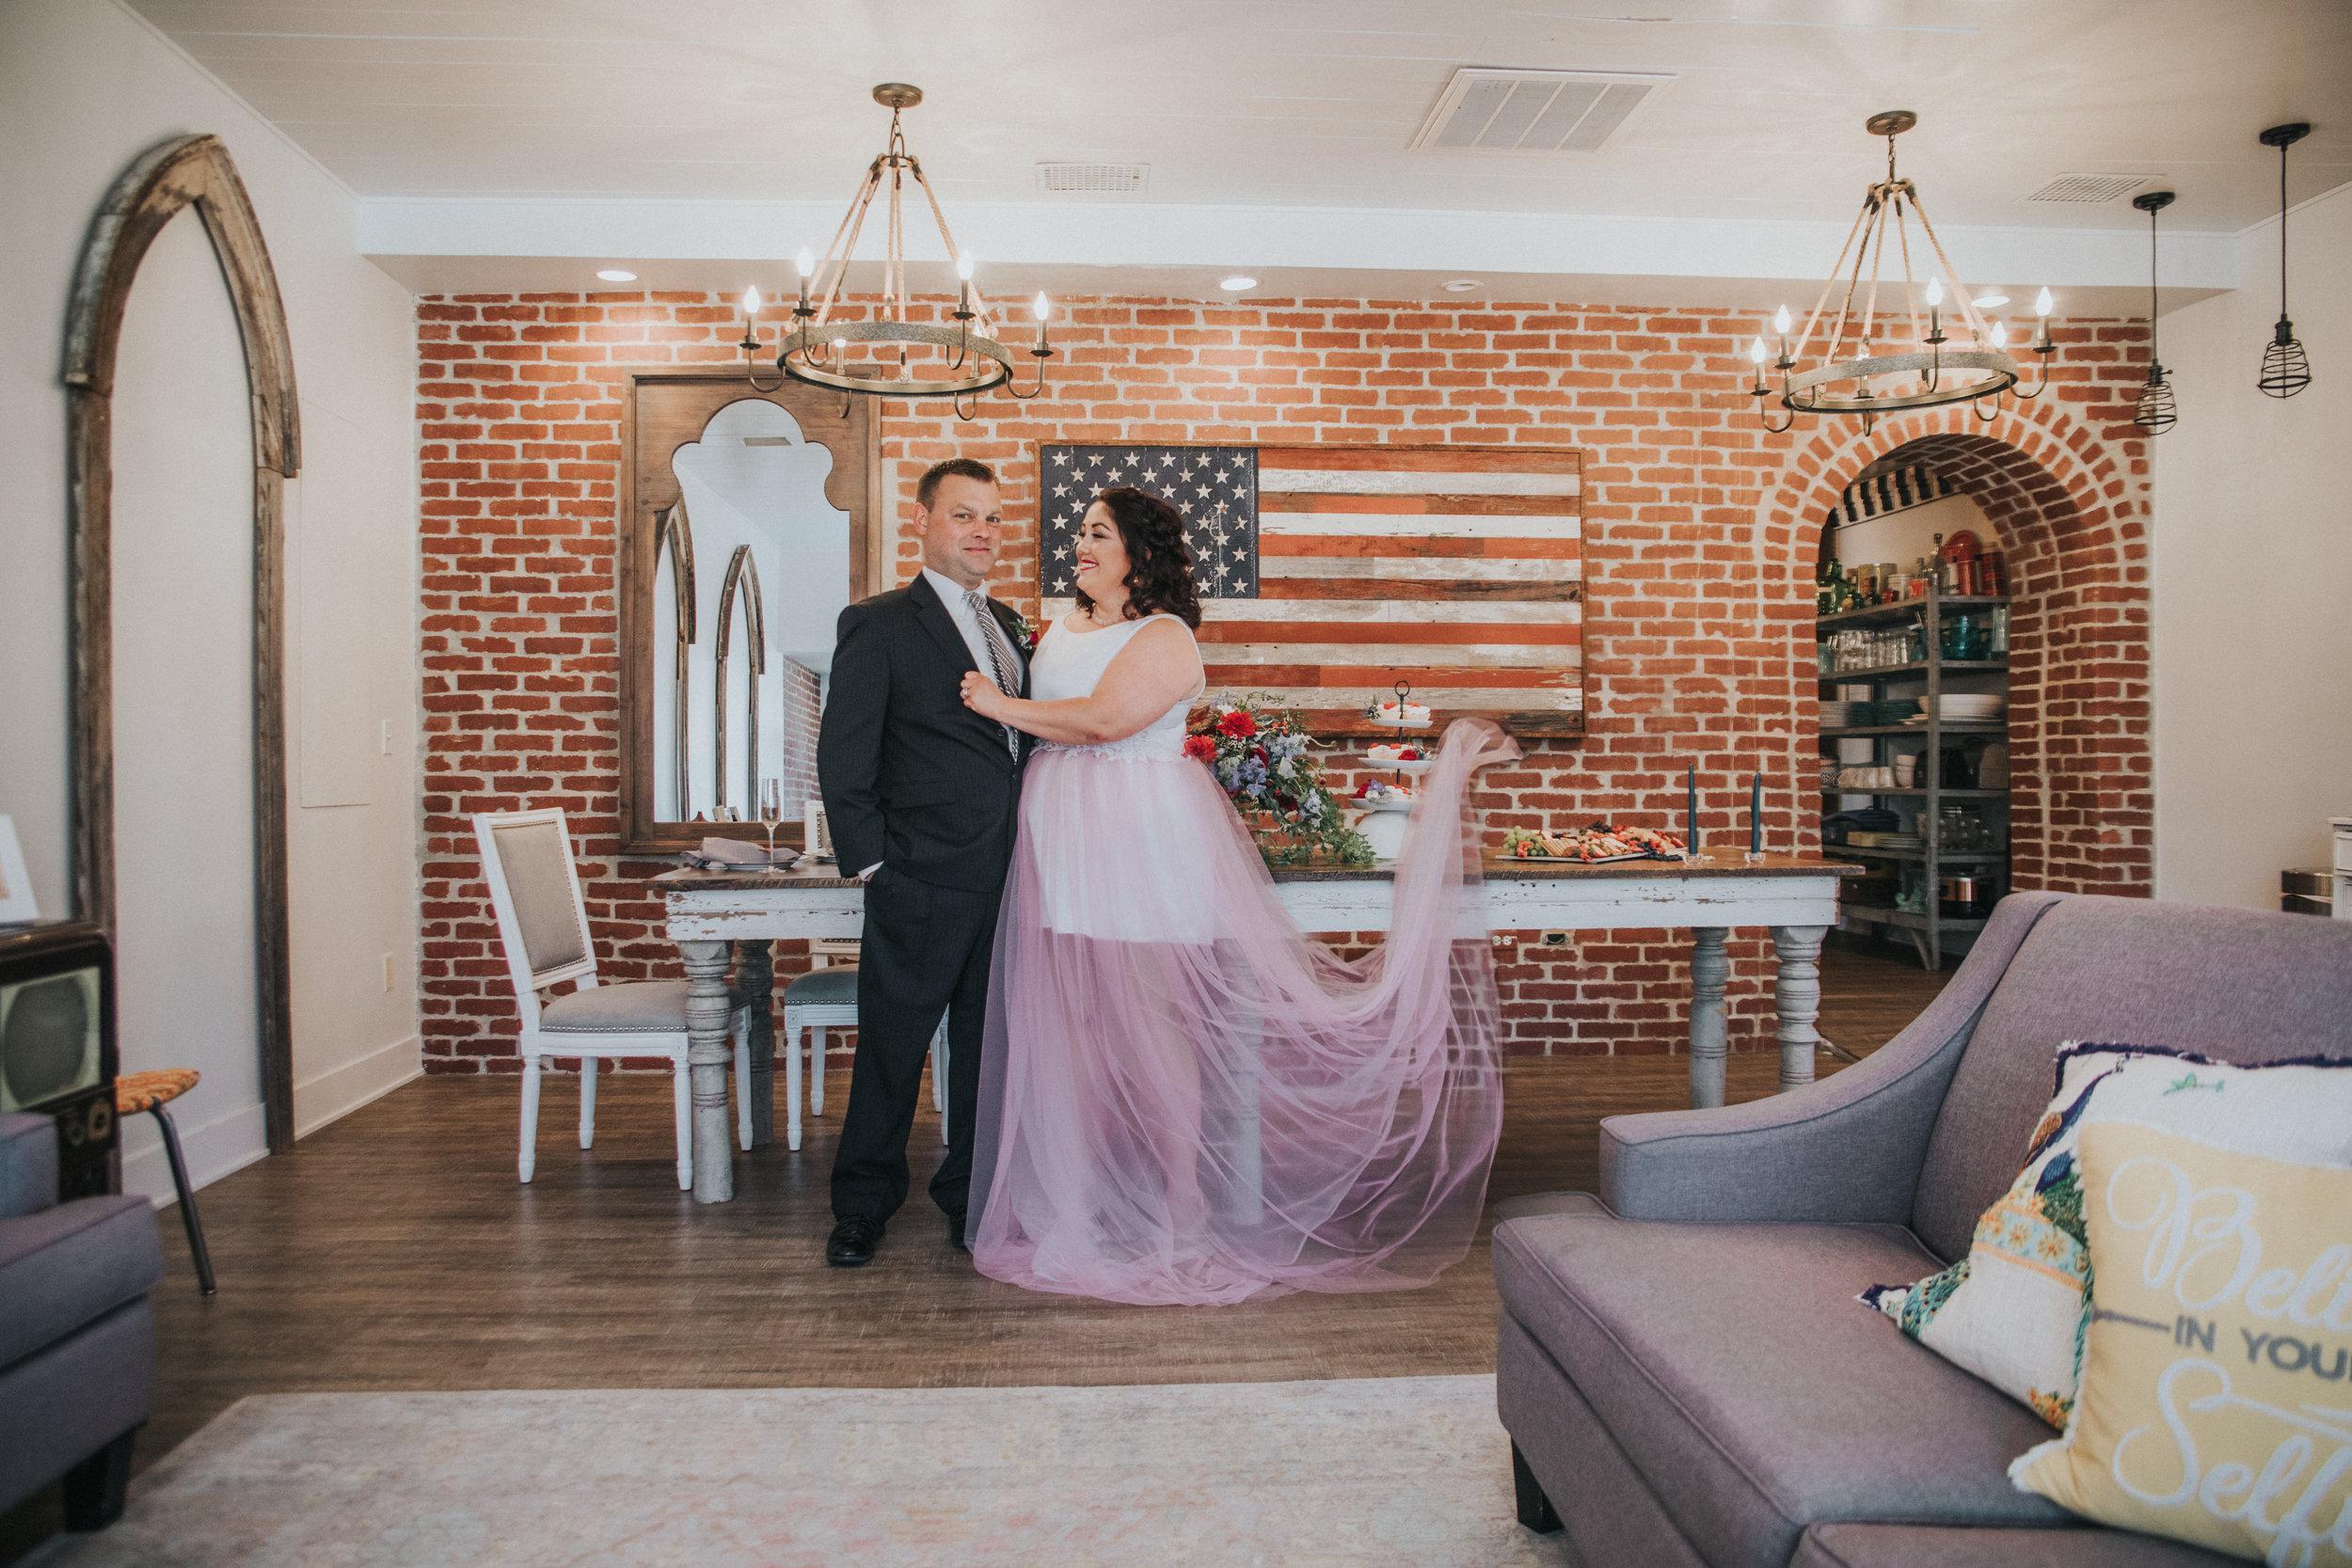 52 midwest-colorado-nebraska-elopement-photography-gretna-turtledoves.jpg